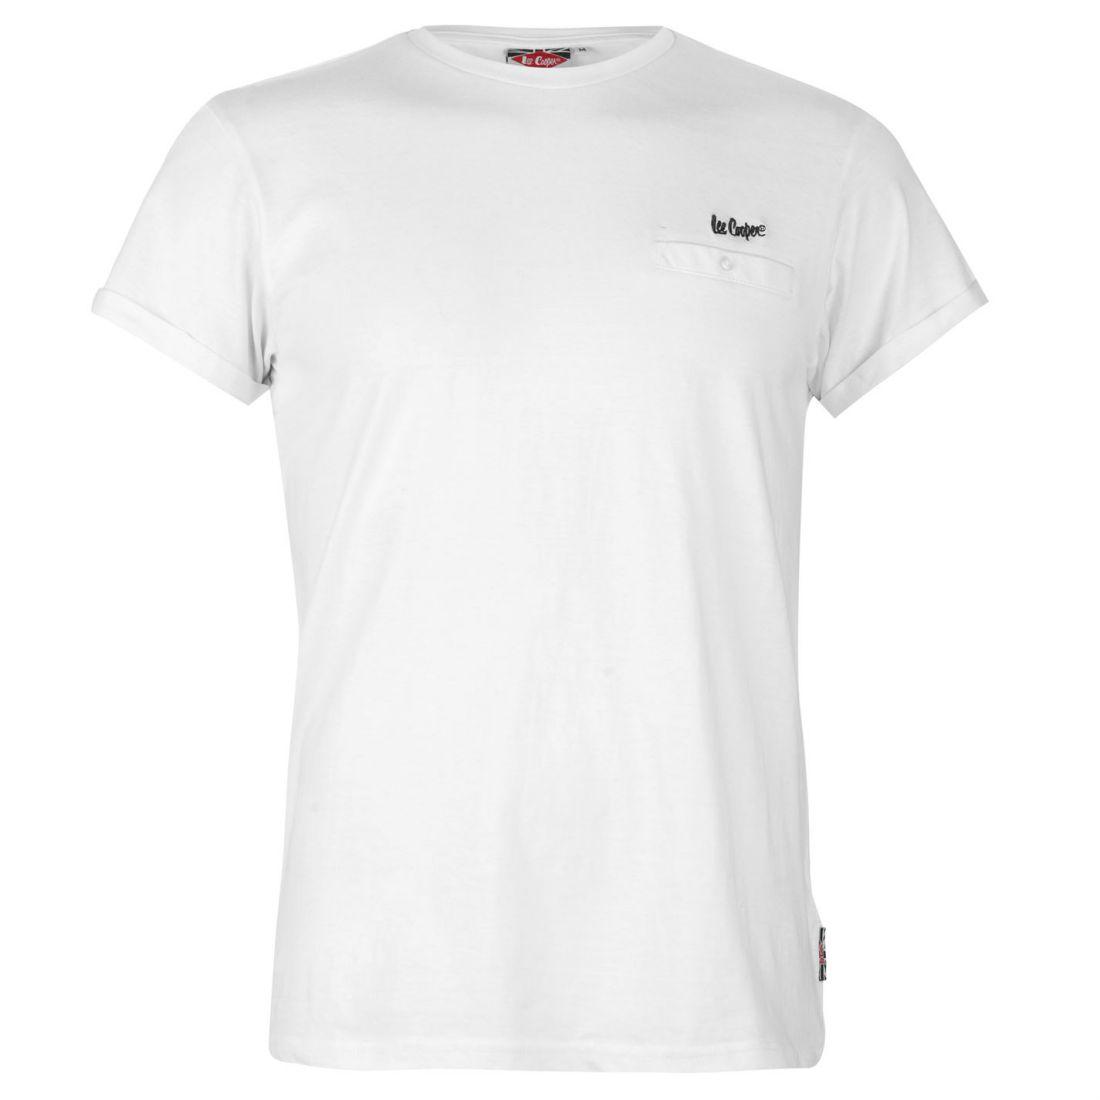 Lee Cooper Pocket T Shirt Ladies Crew Neck Tee Top Short Sleeve Cotton Chest